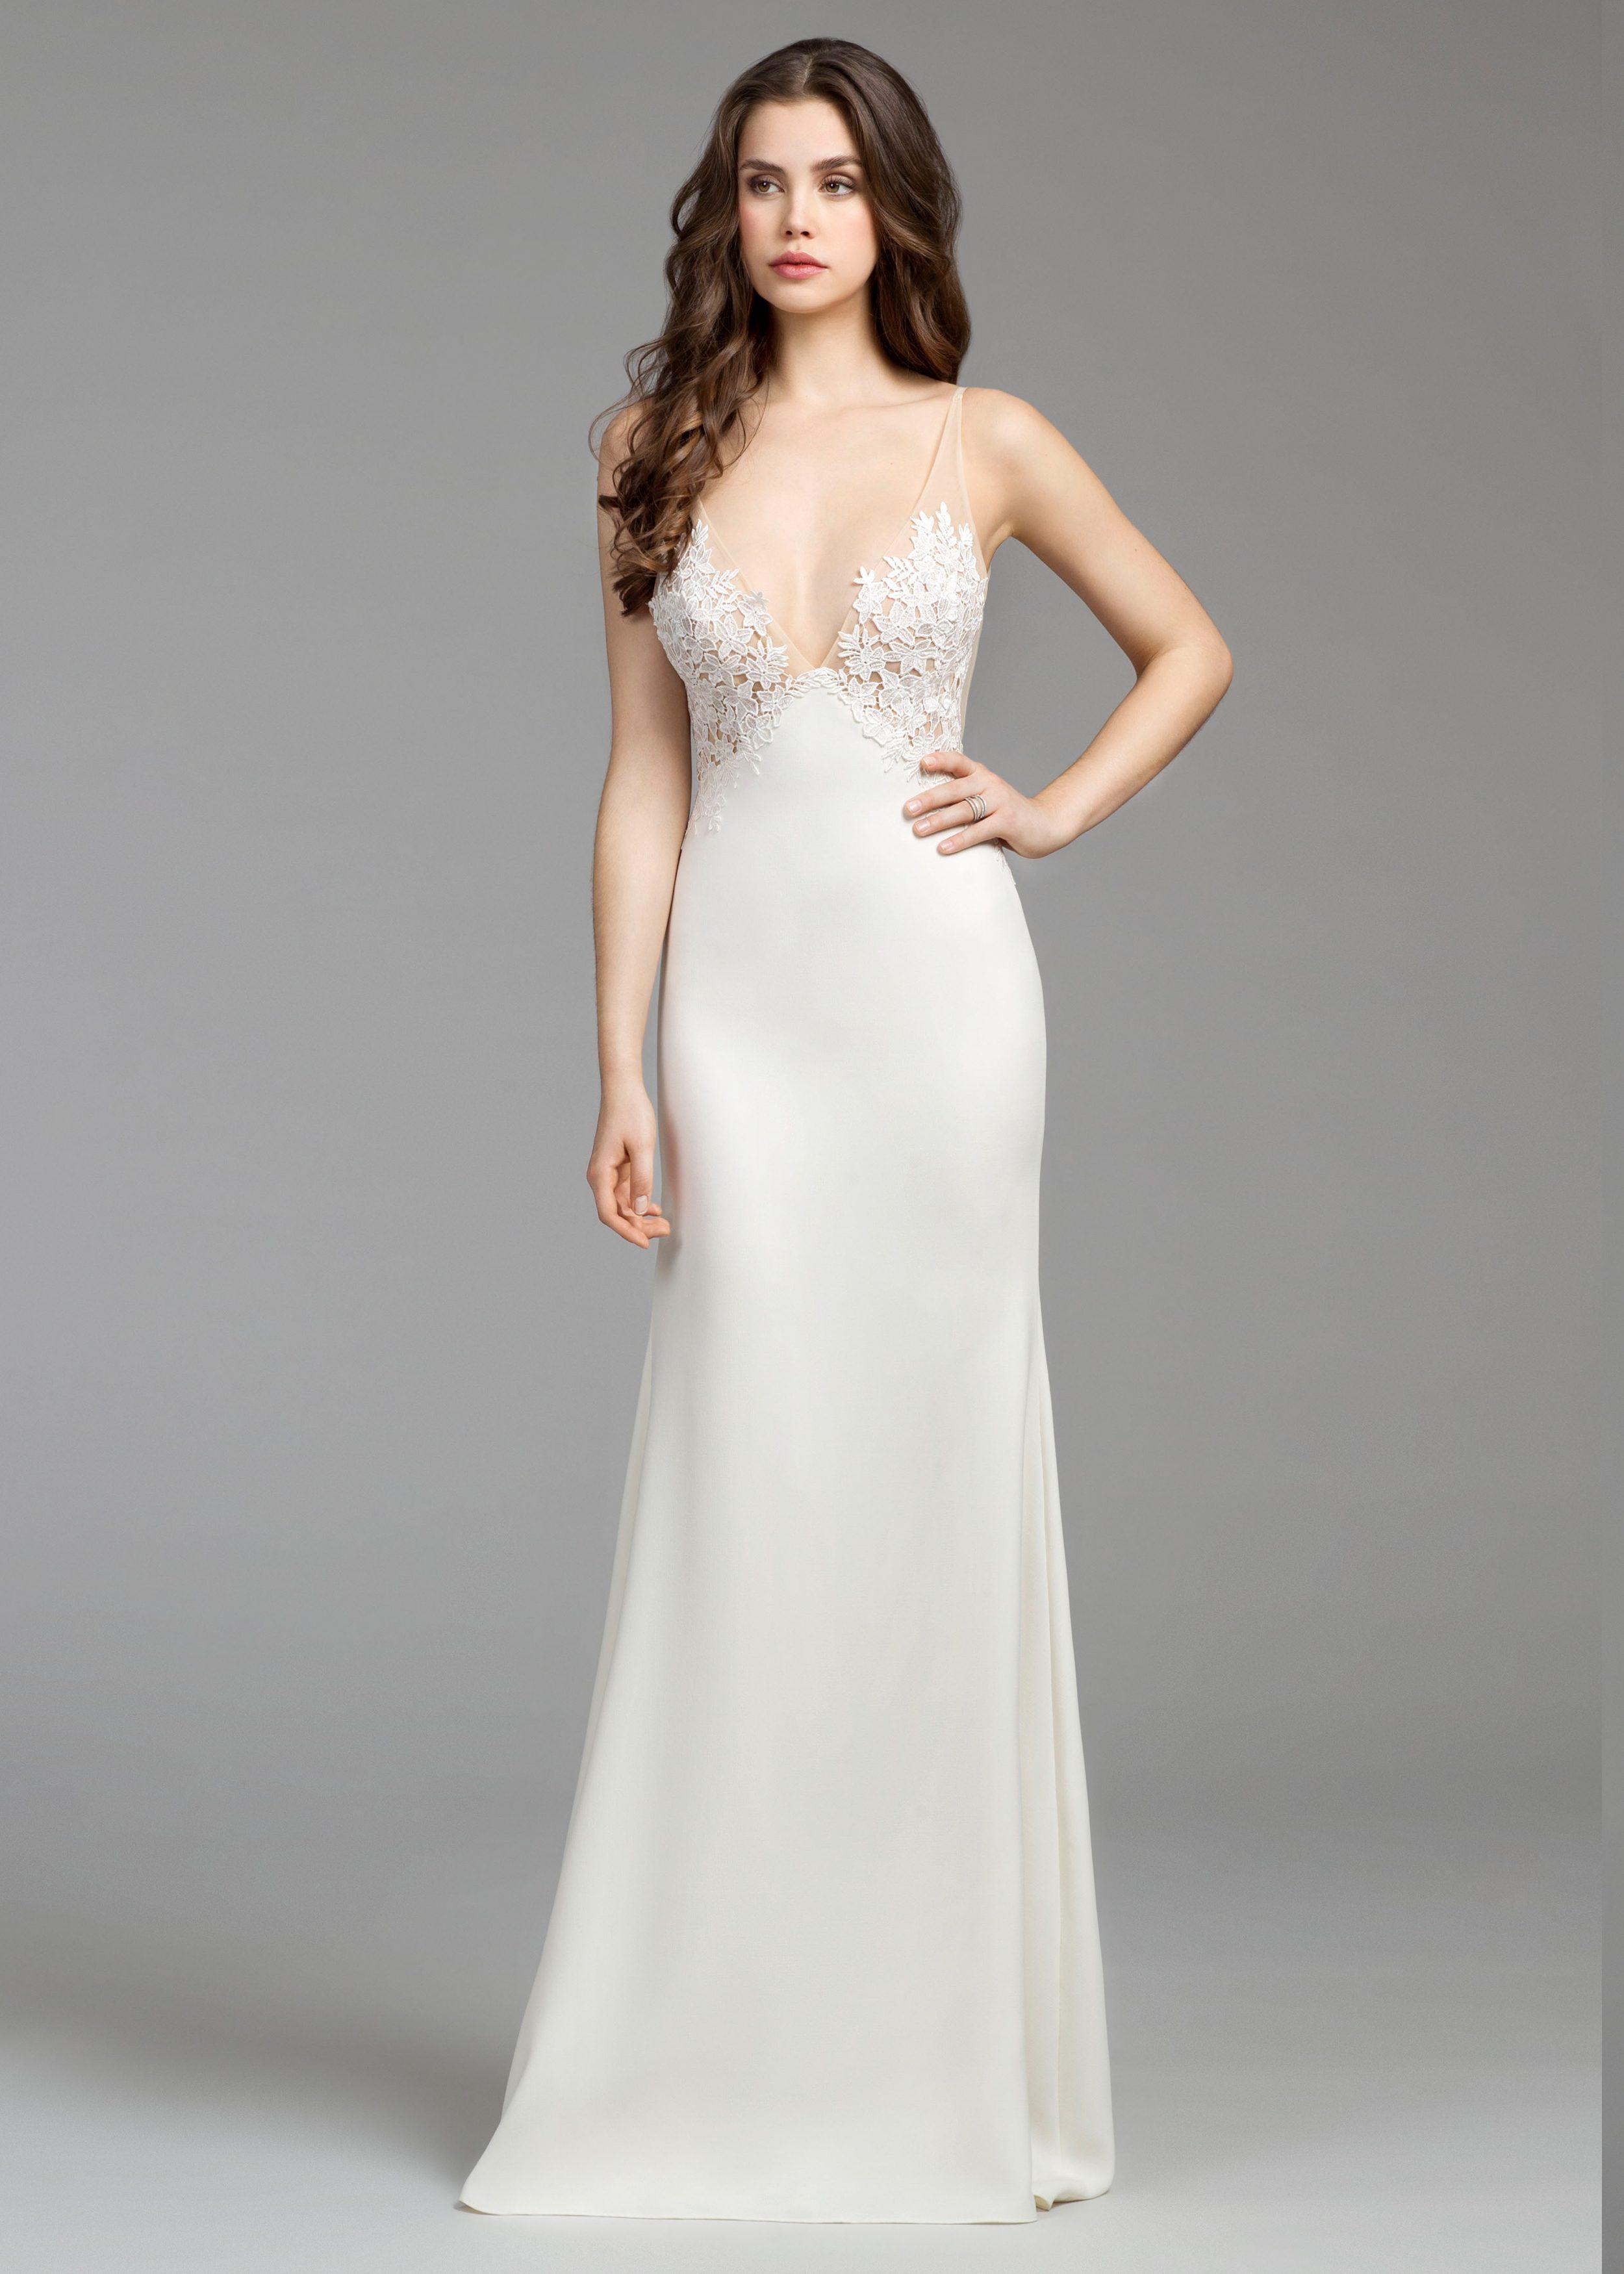 b706e5b1be3 Amazing Wedding Dresses For Sale - Data Dynamic AG